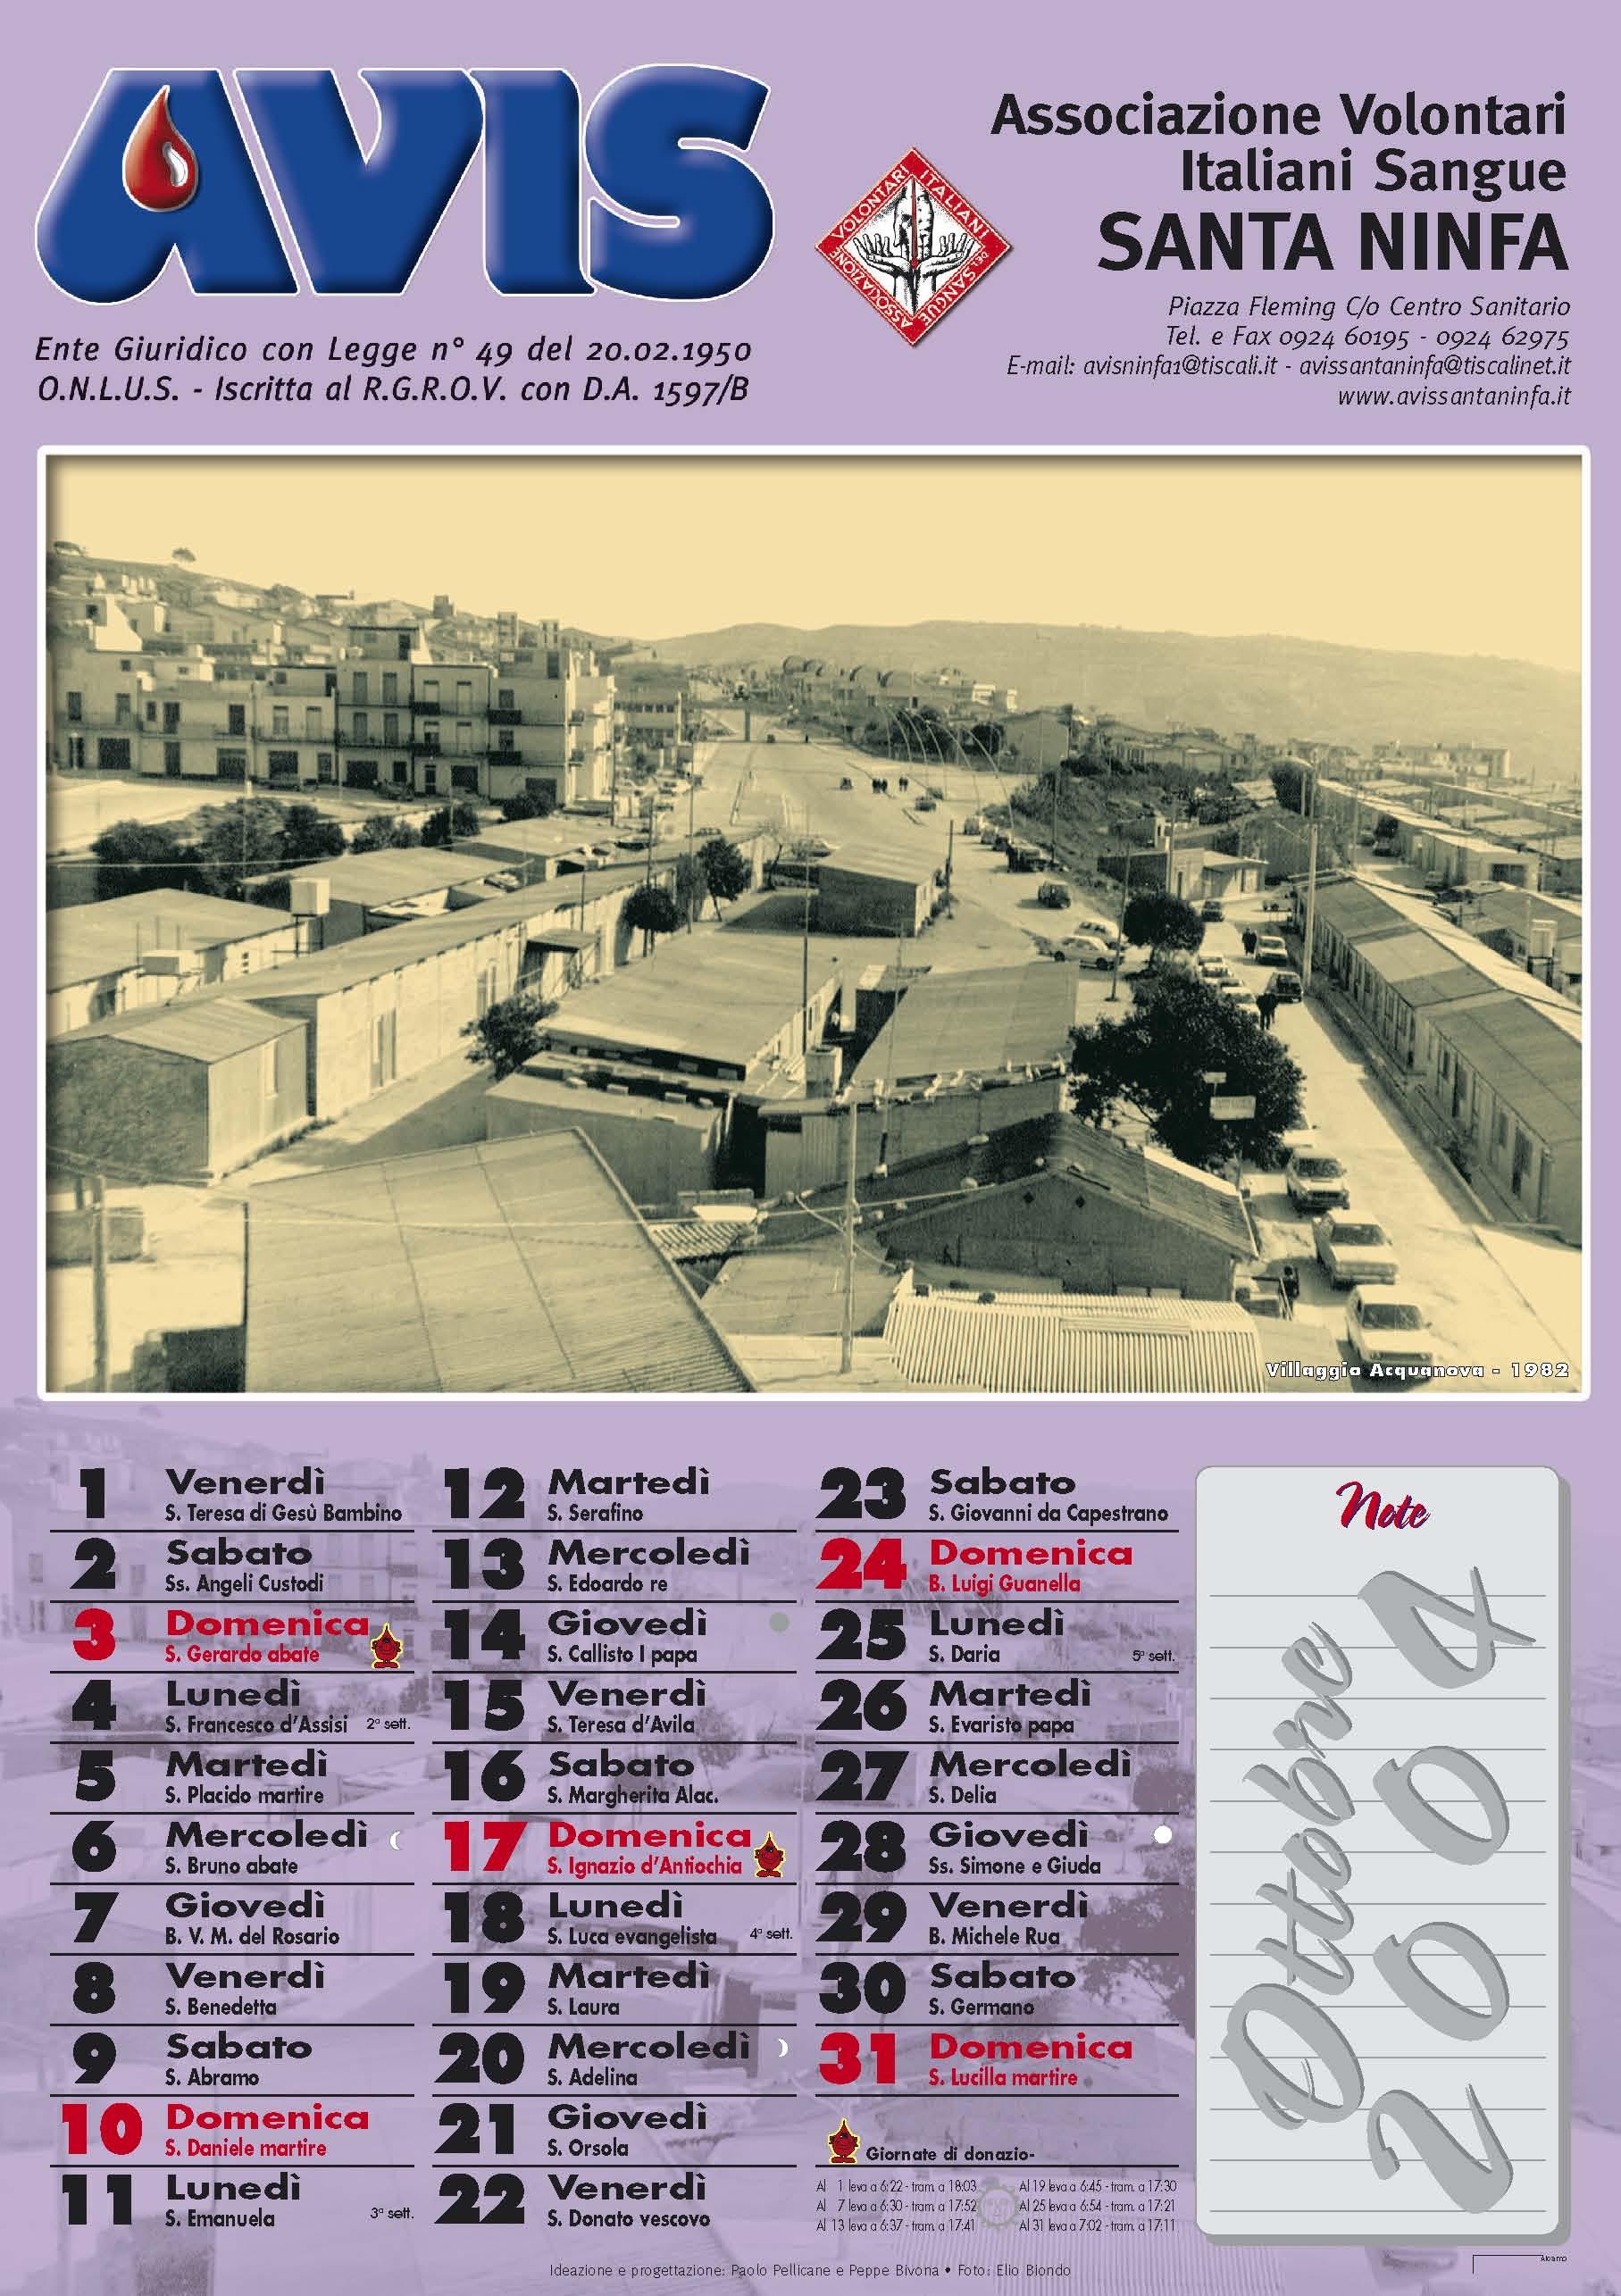 Calendario Avis.Calendario Avis 2004 Avis Santa Ninfa